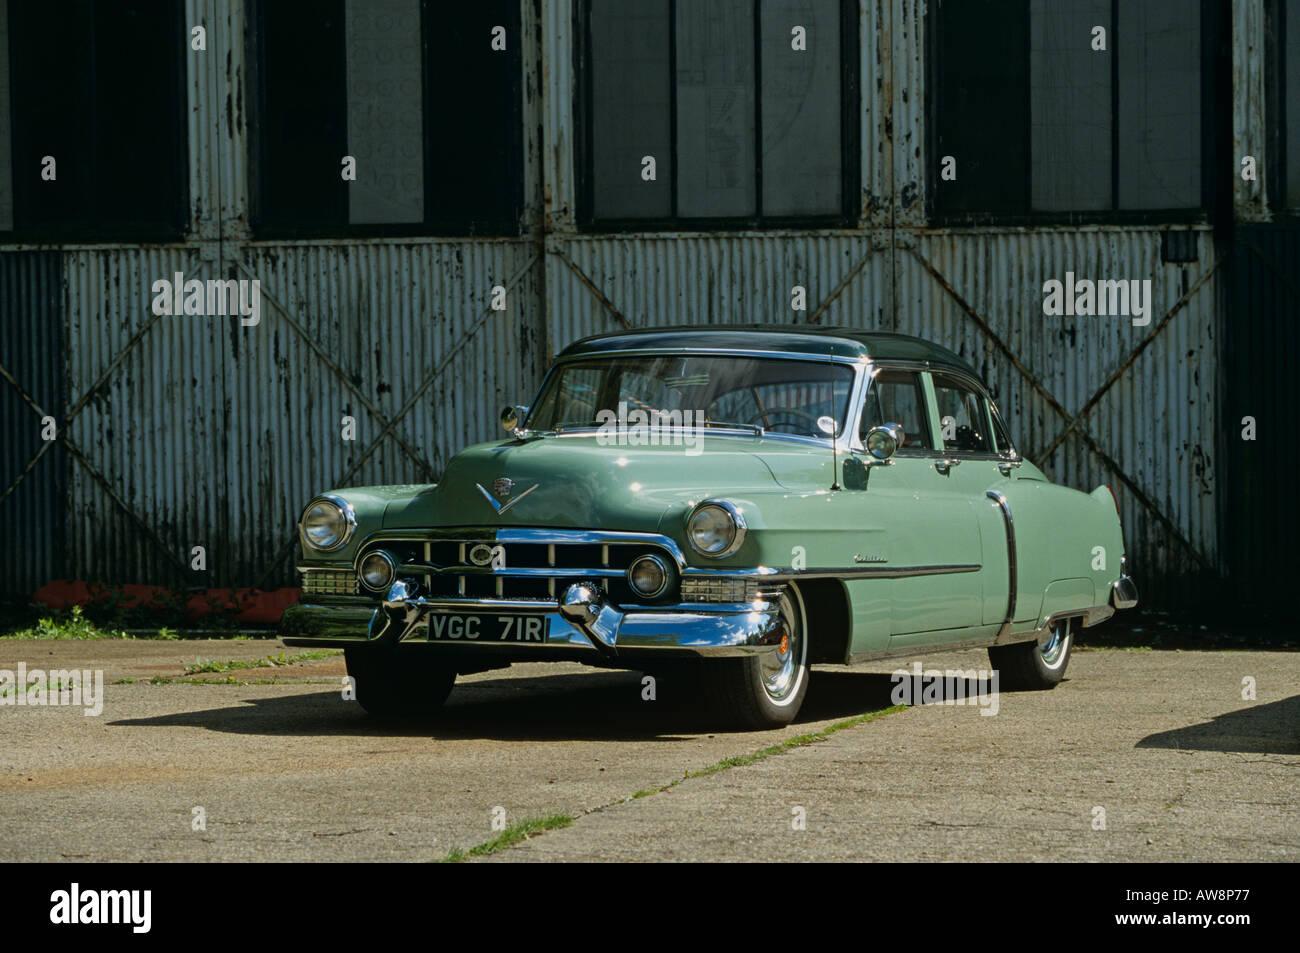 Cadillac Series 62 Images Stock Photos 1951 Convertible Sedan Of Image